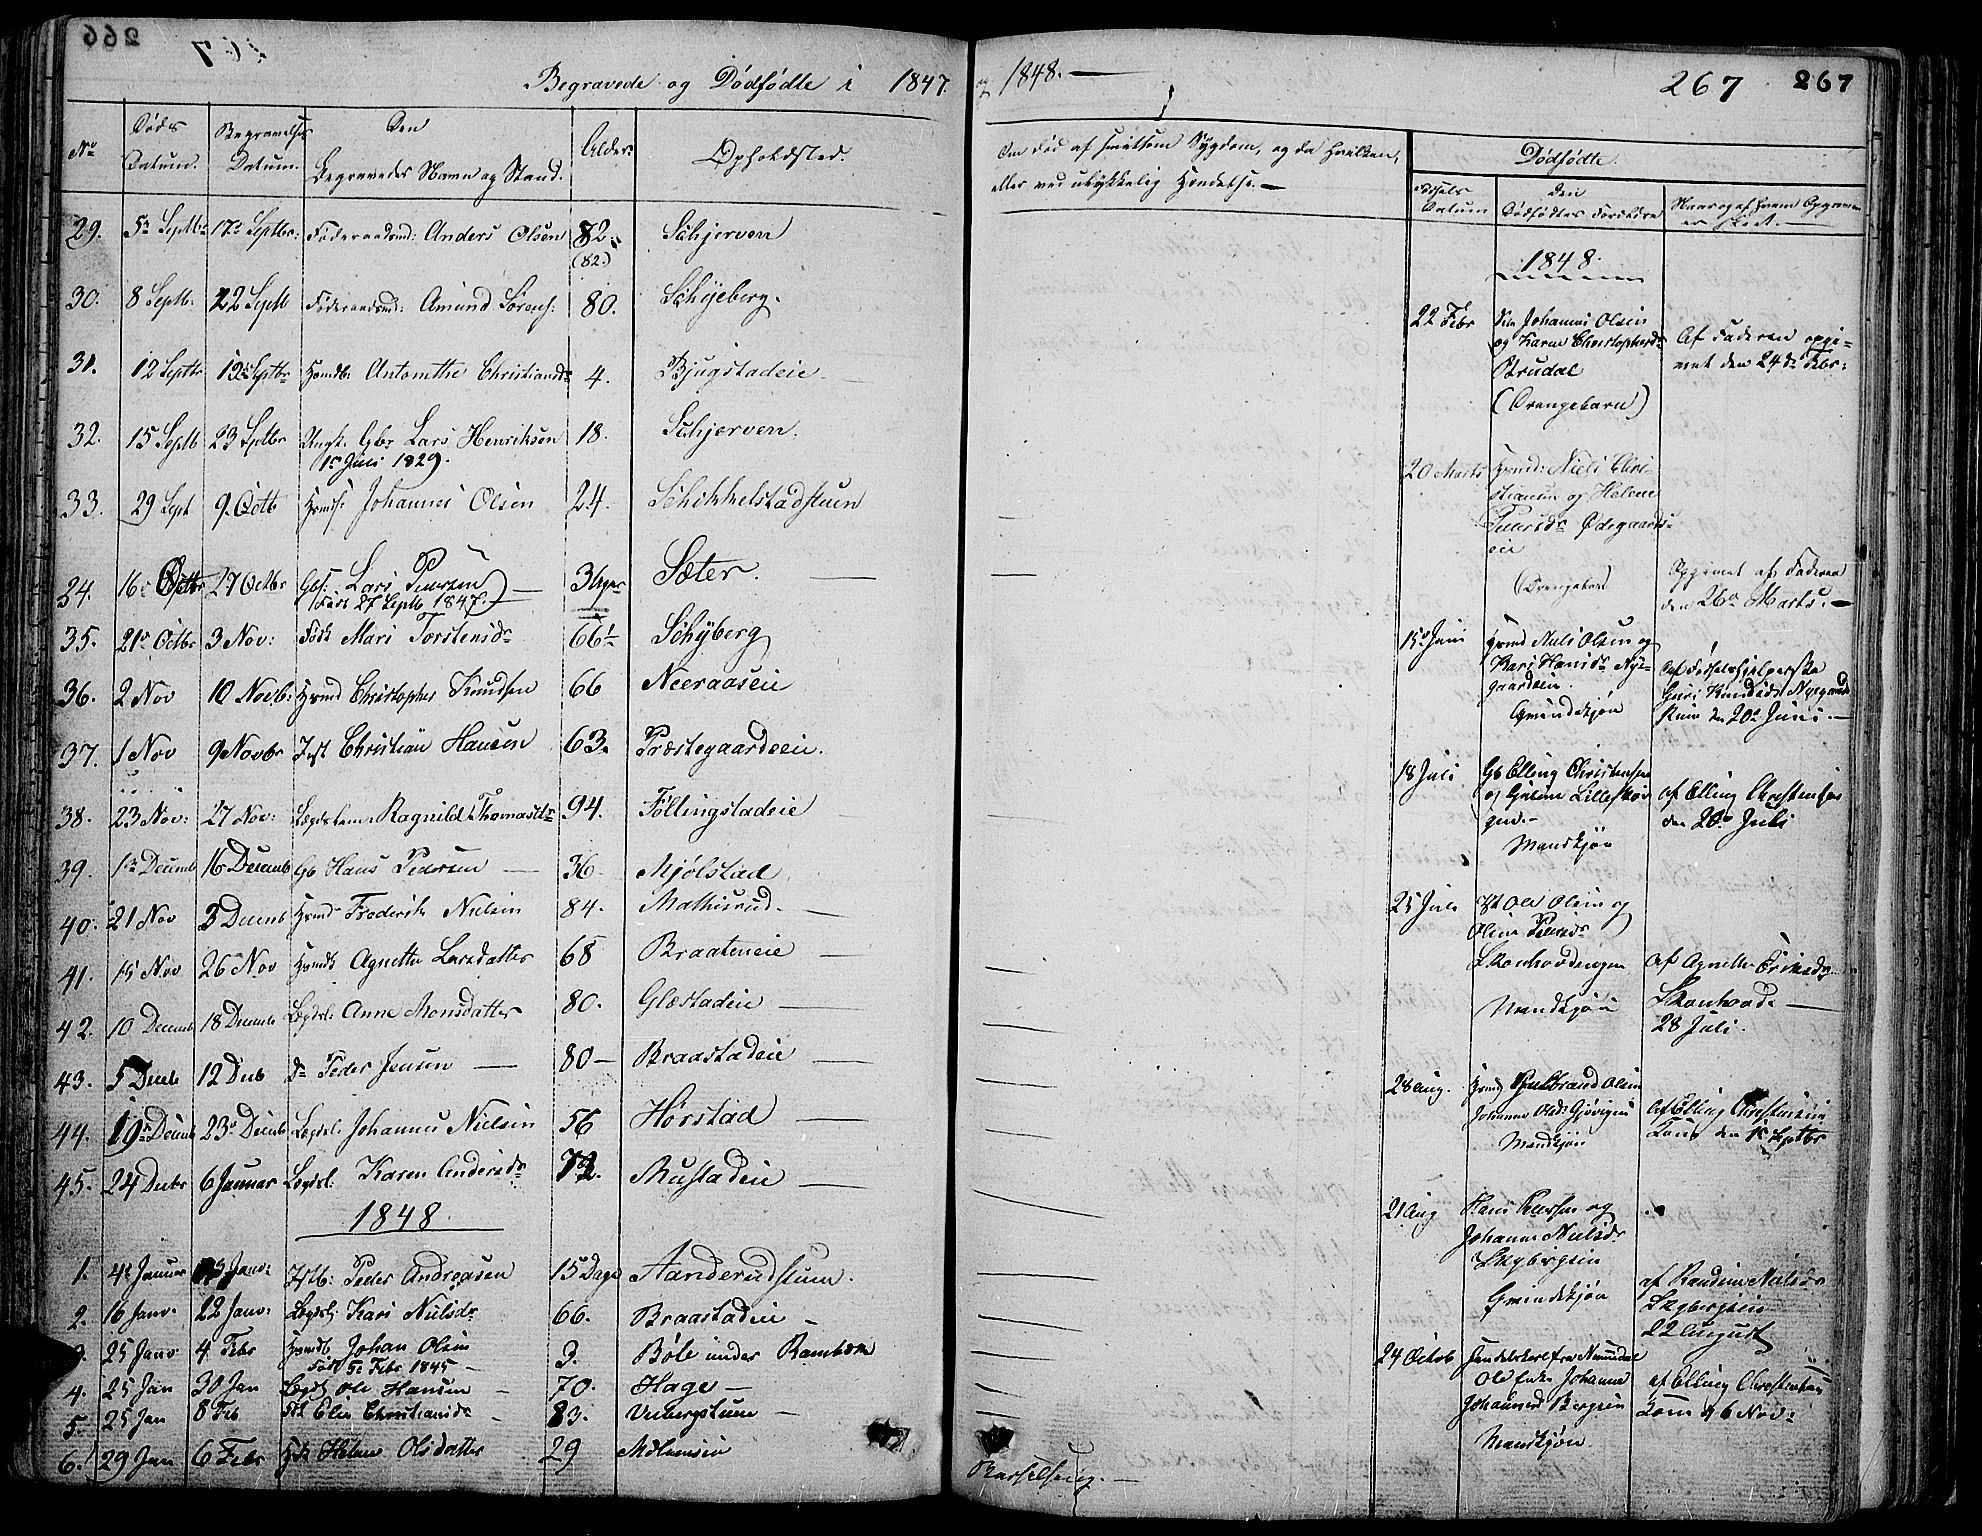 SAH, Vardal prestekontor, H/Ha/Hab/L0004: Klokkerbok nr. 4, 1831-1853, s. 267